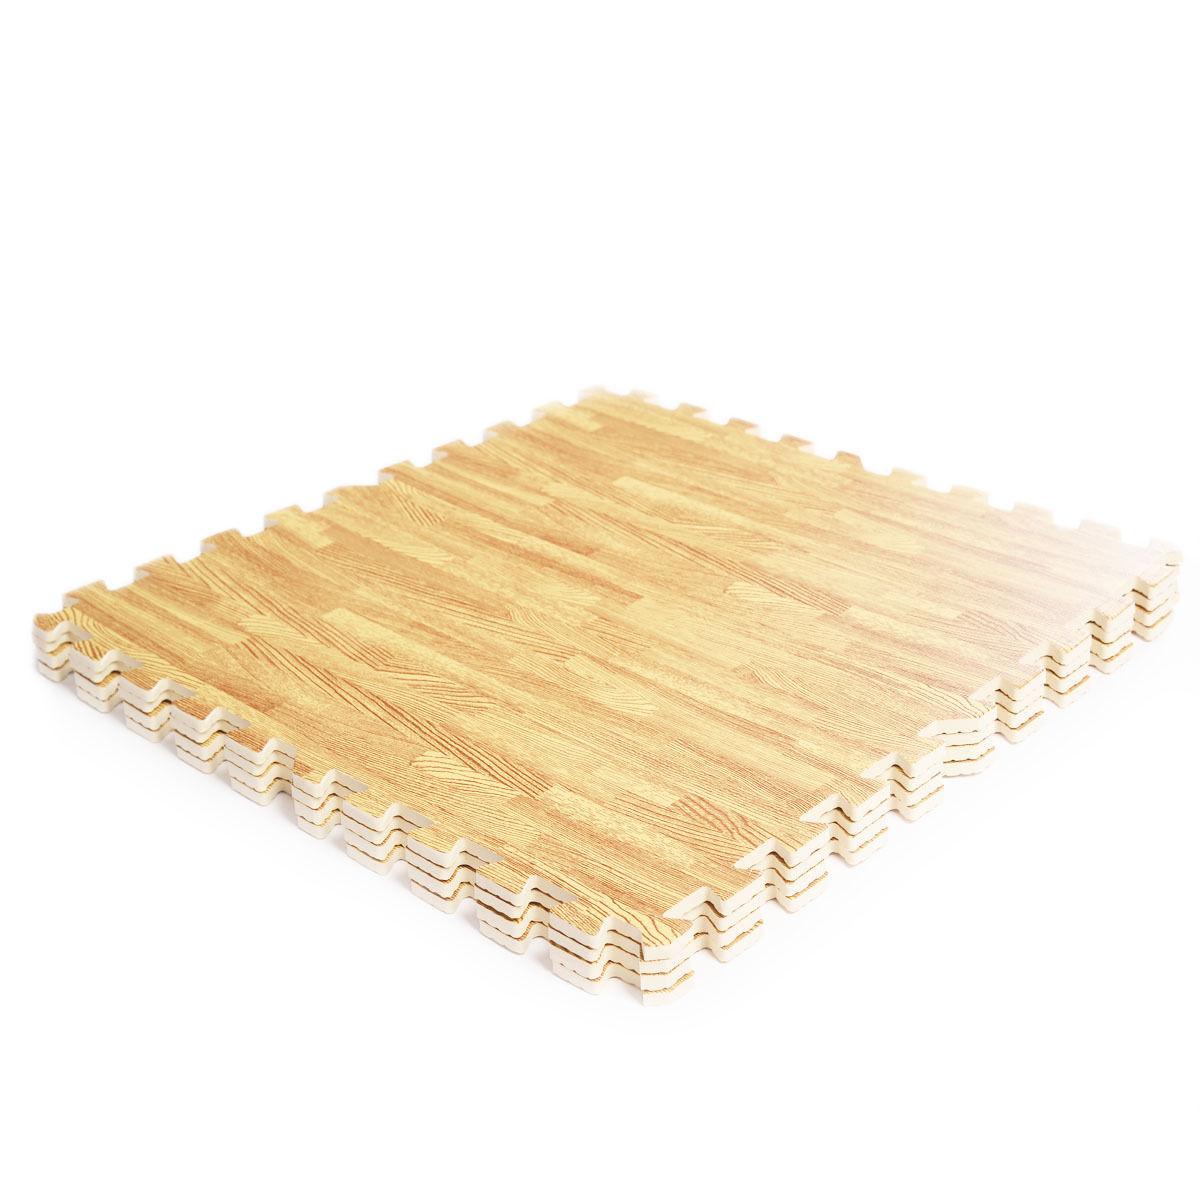 48 Sq Ft EVA Foam Floor Interlocking Mat Show Floor Gym Mat